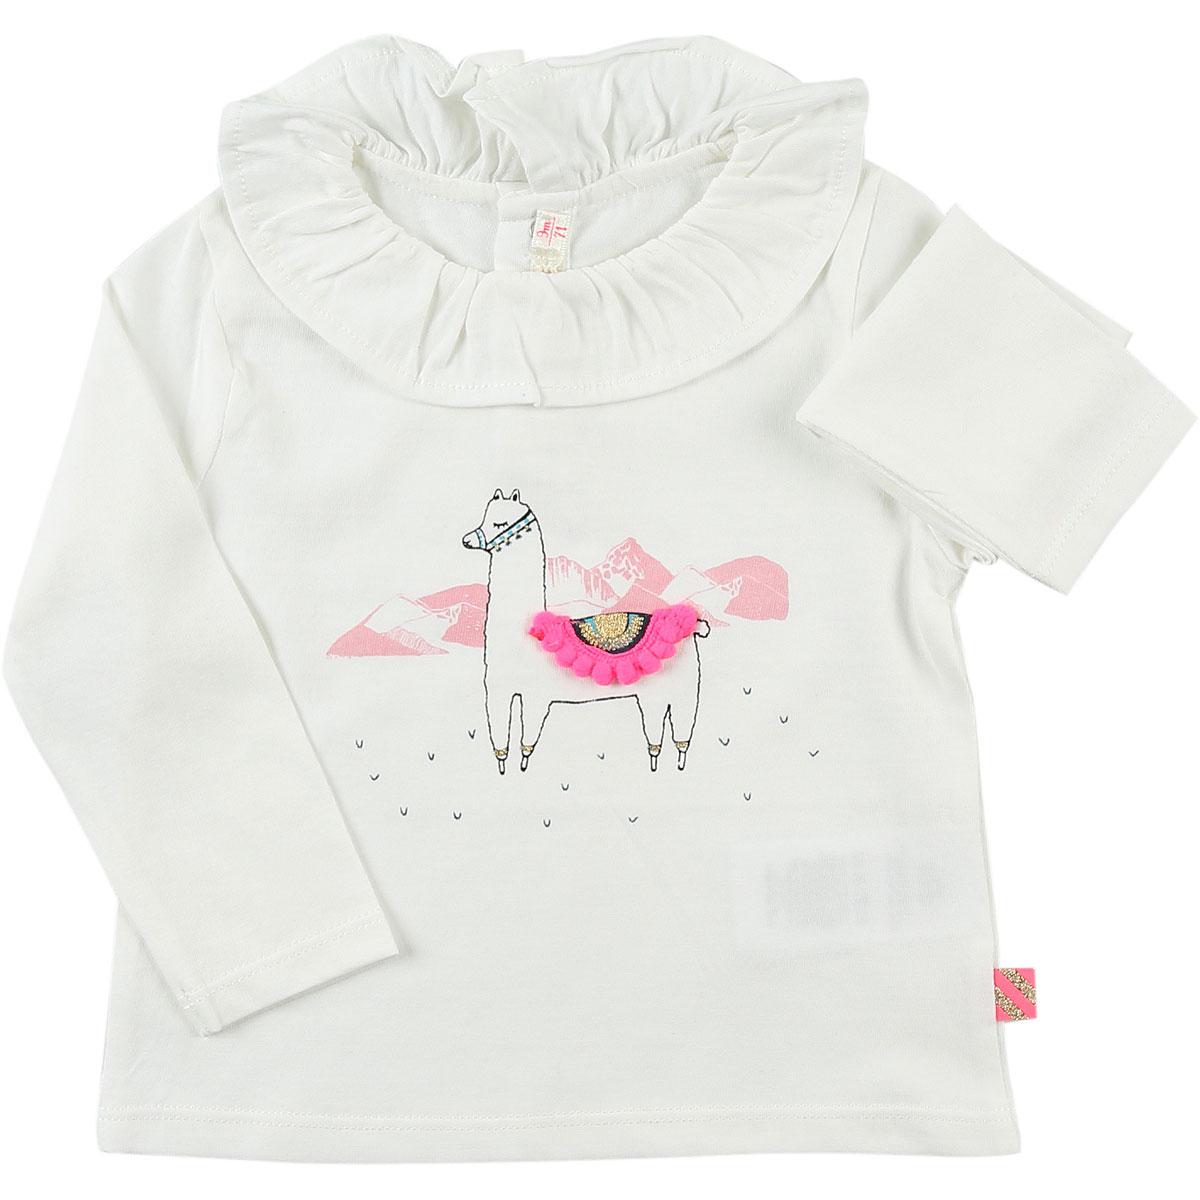 Image of Billieblush Baby T-Shirt for Girls, White, Cotton, 2017, 12M 6M 9M